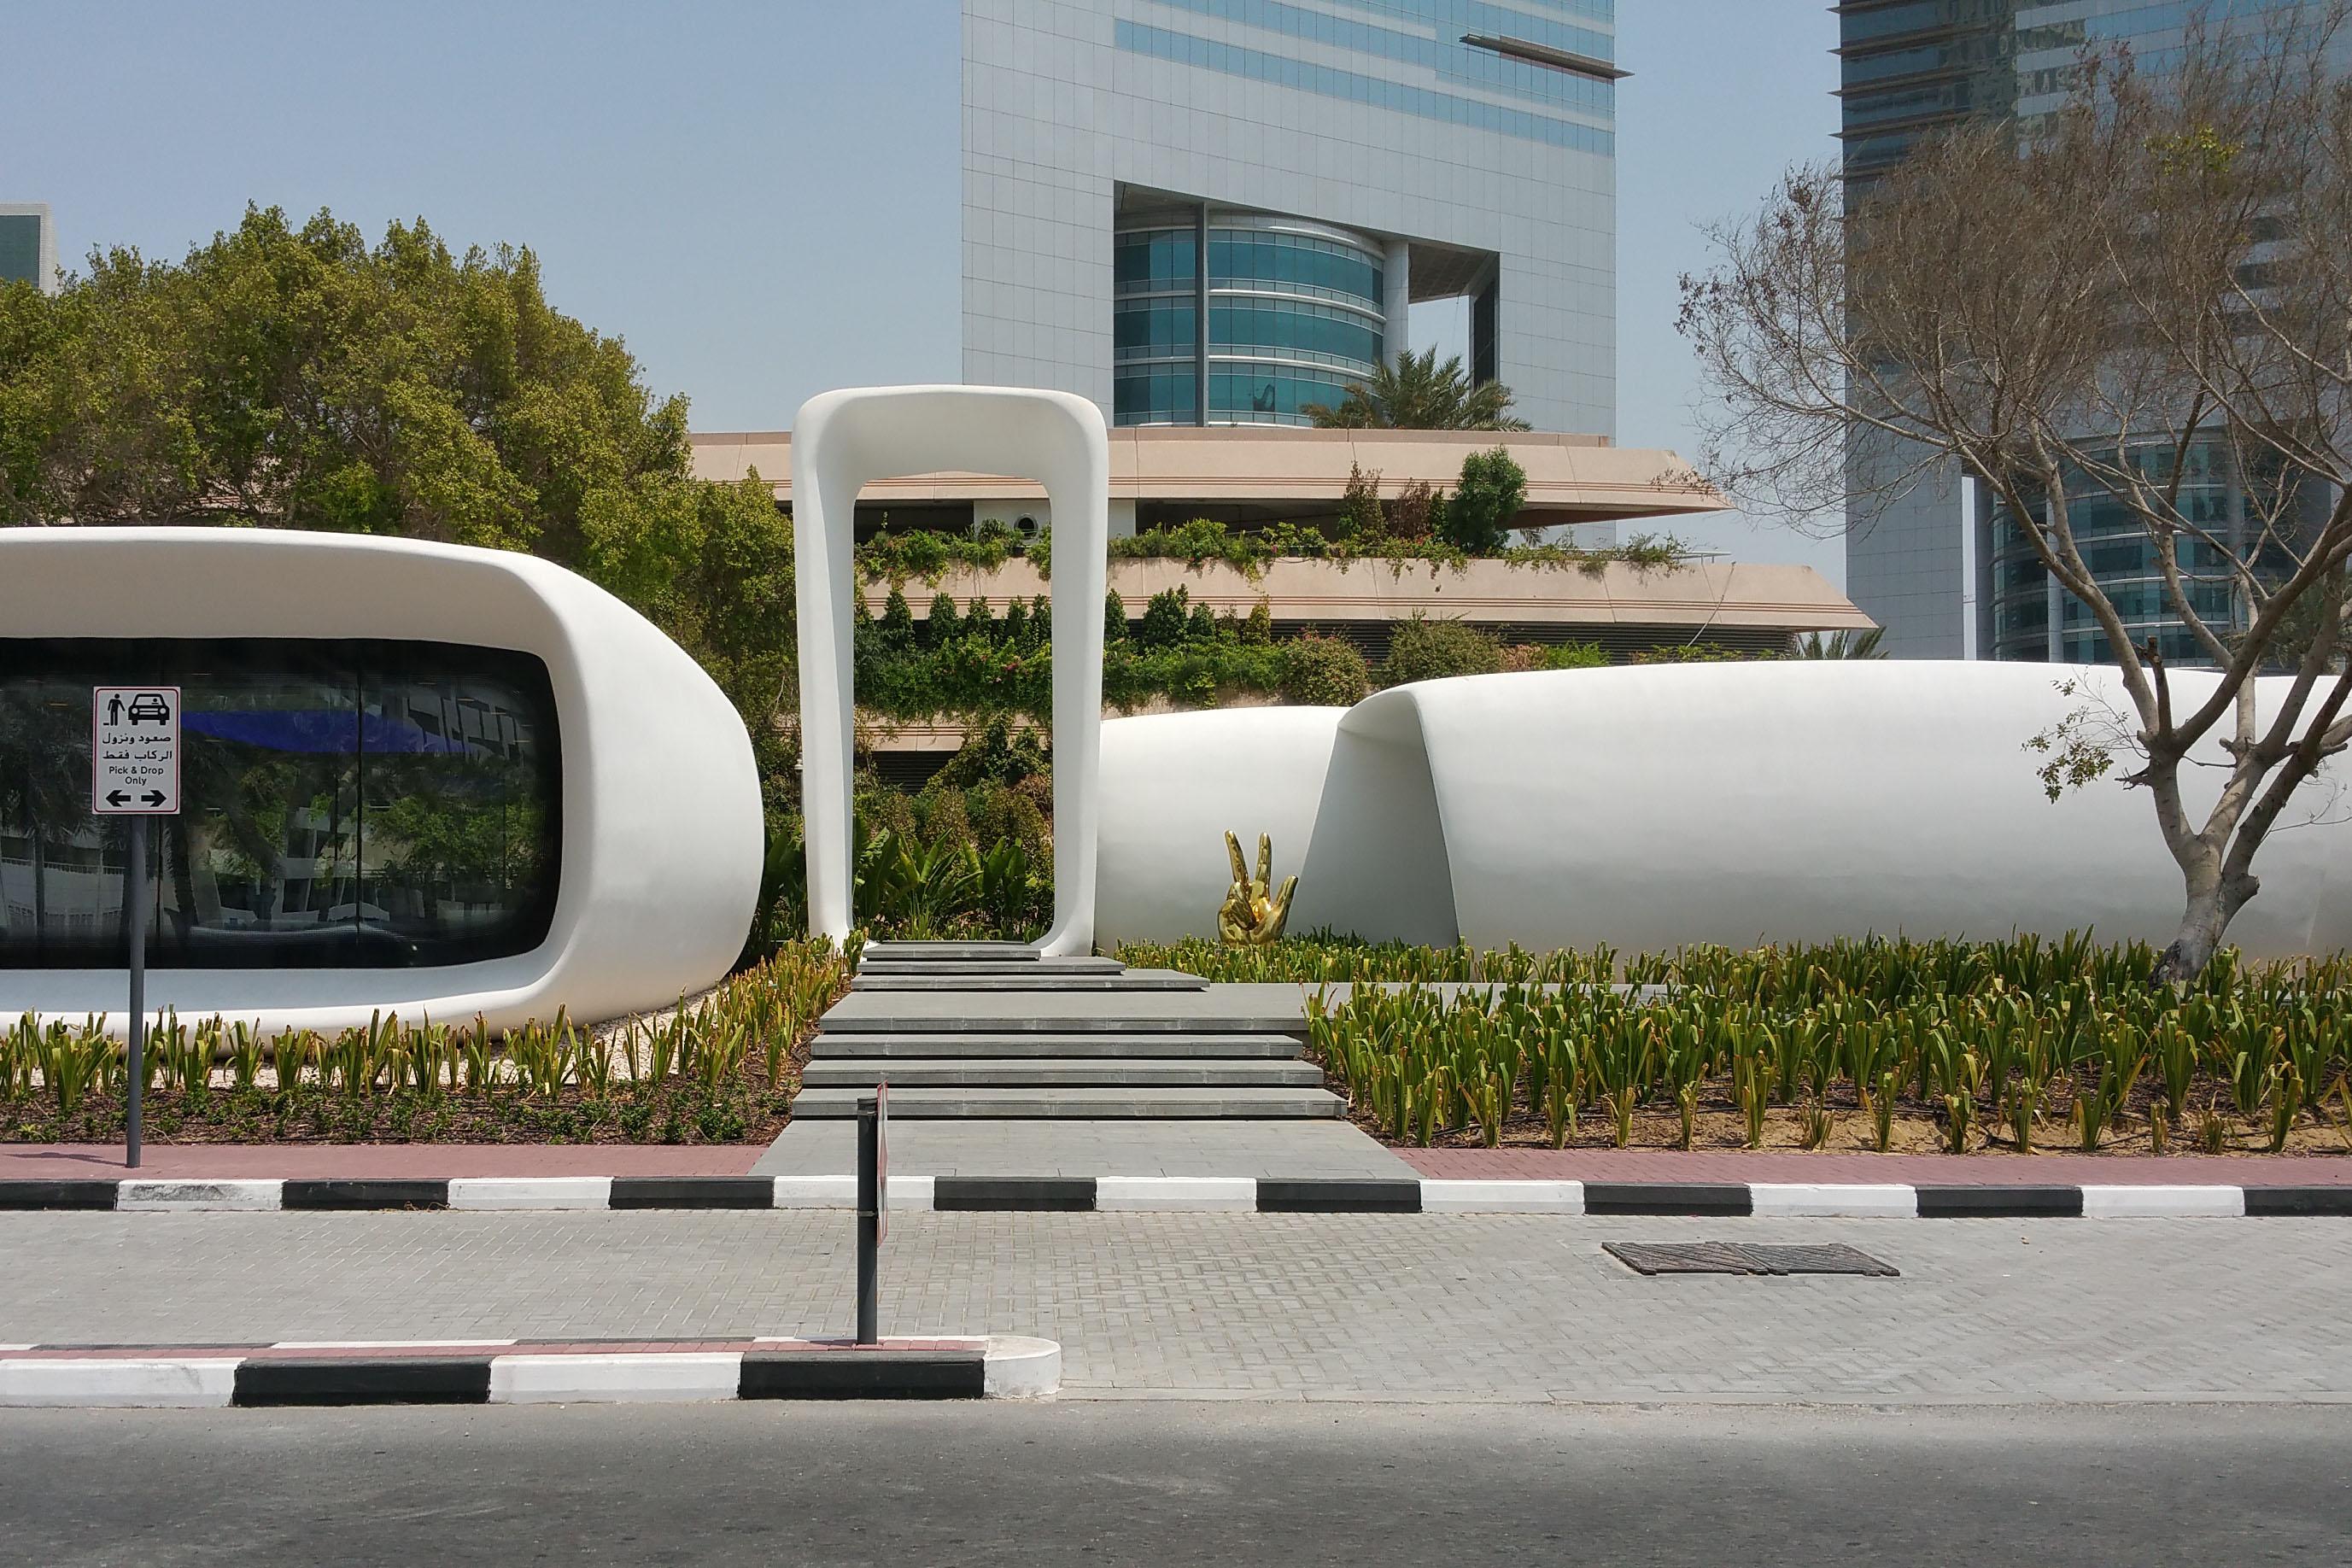 3d printed office Dubai | design Killa Architects| 2016